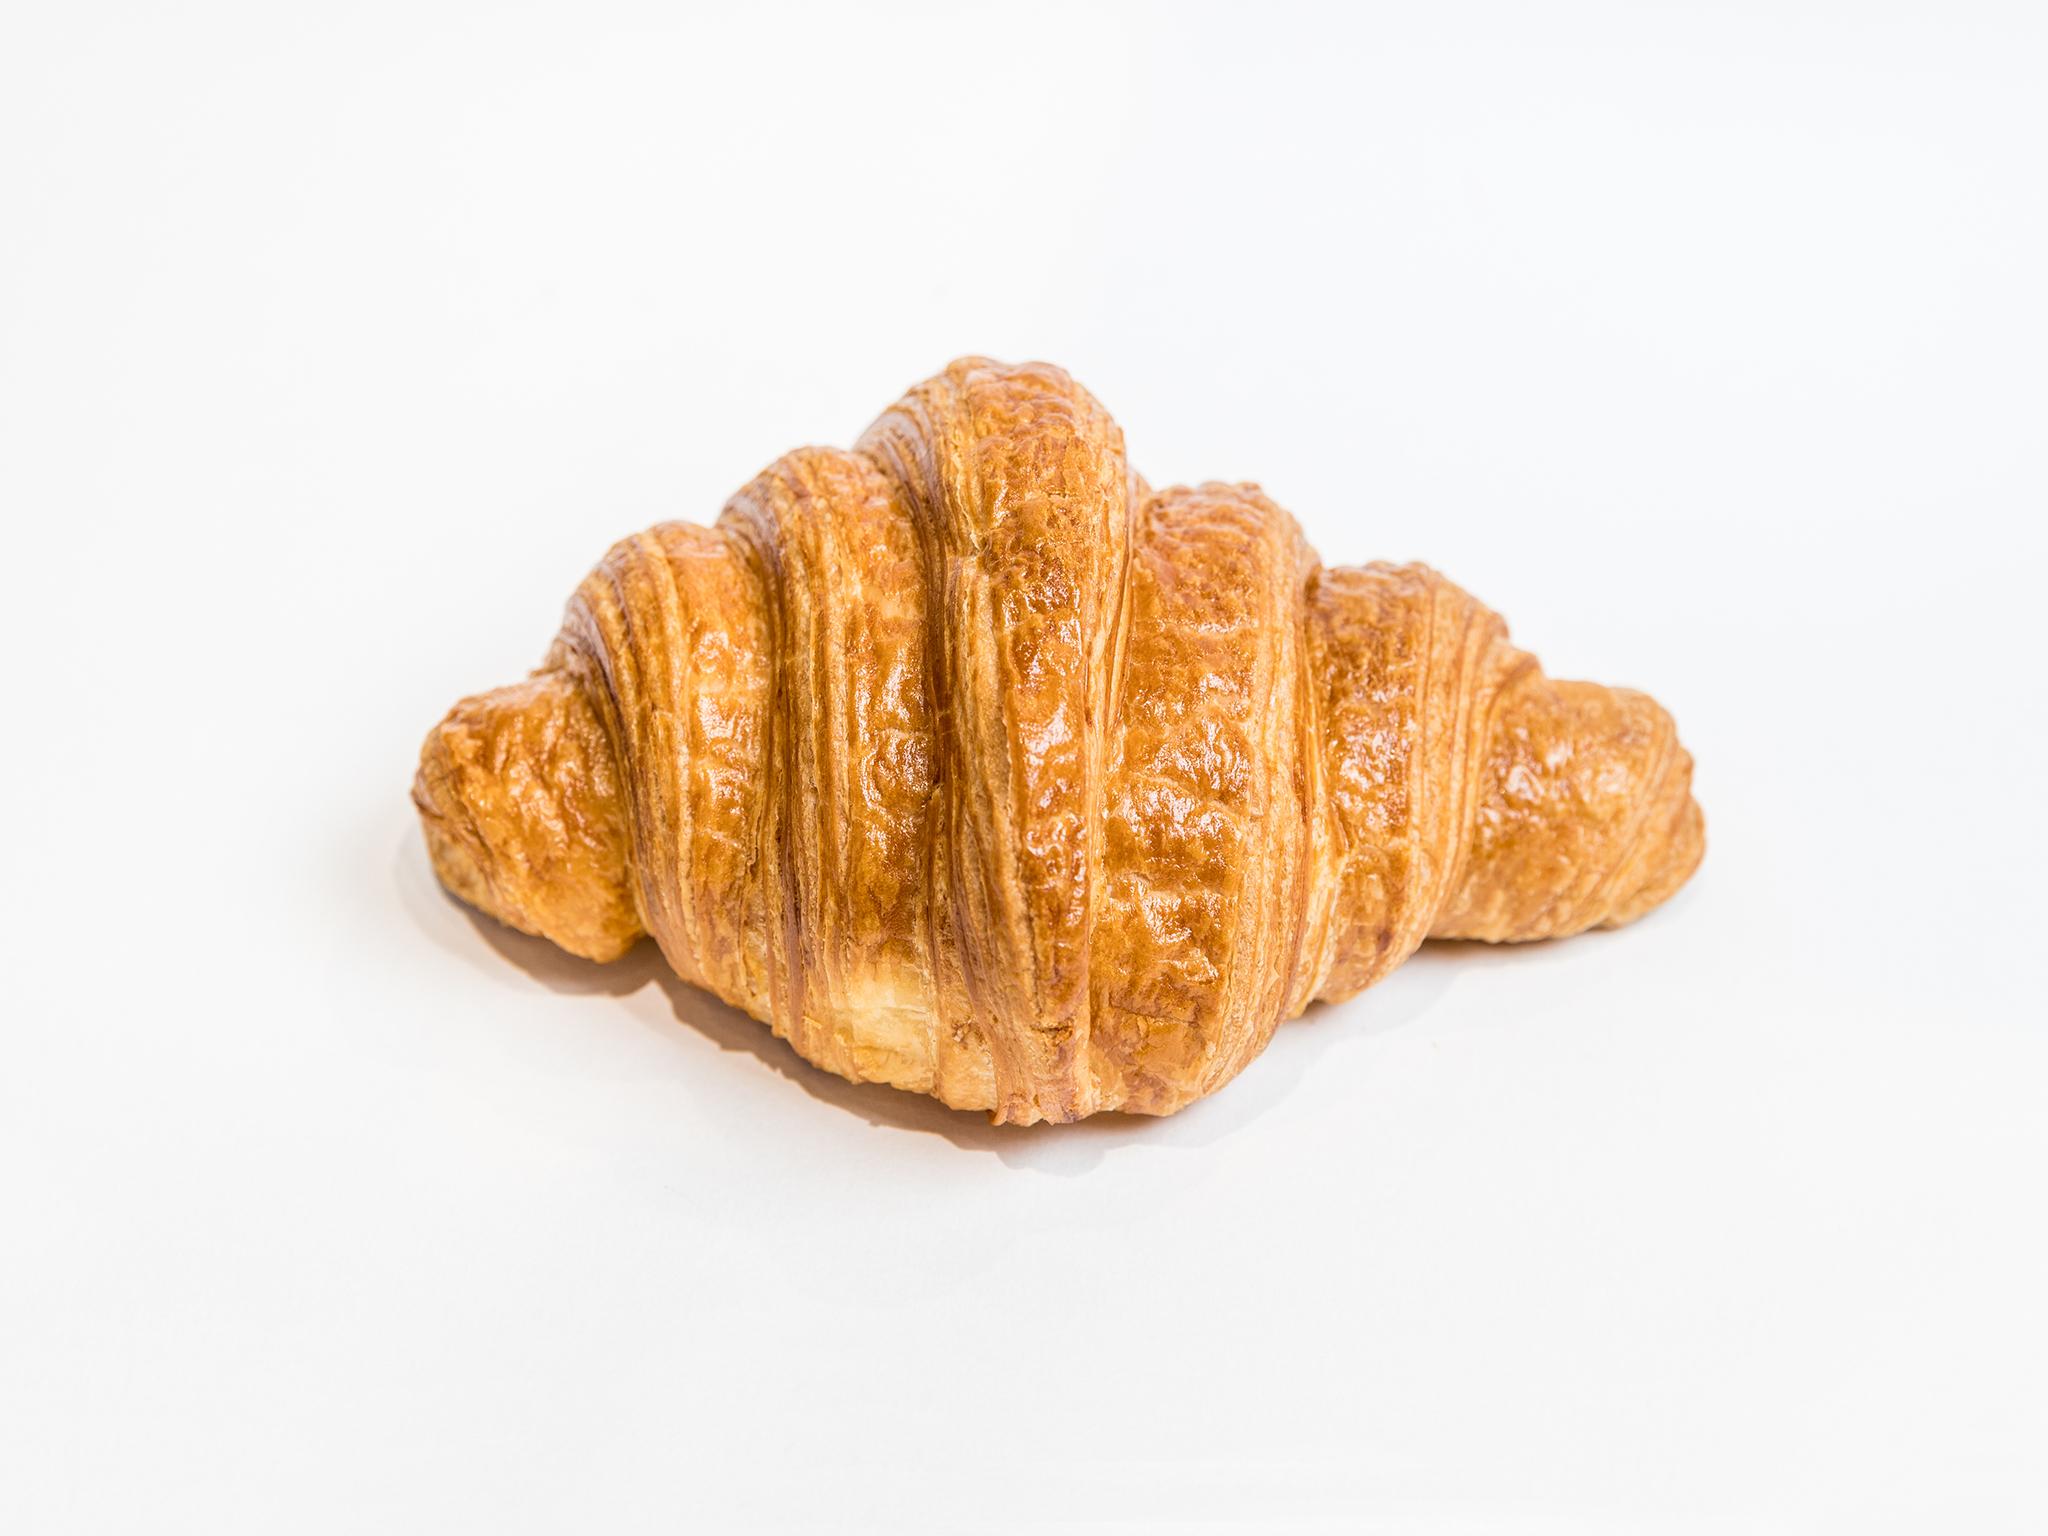 O Moço dos Croissants